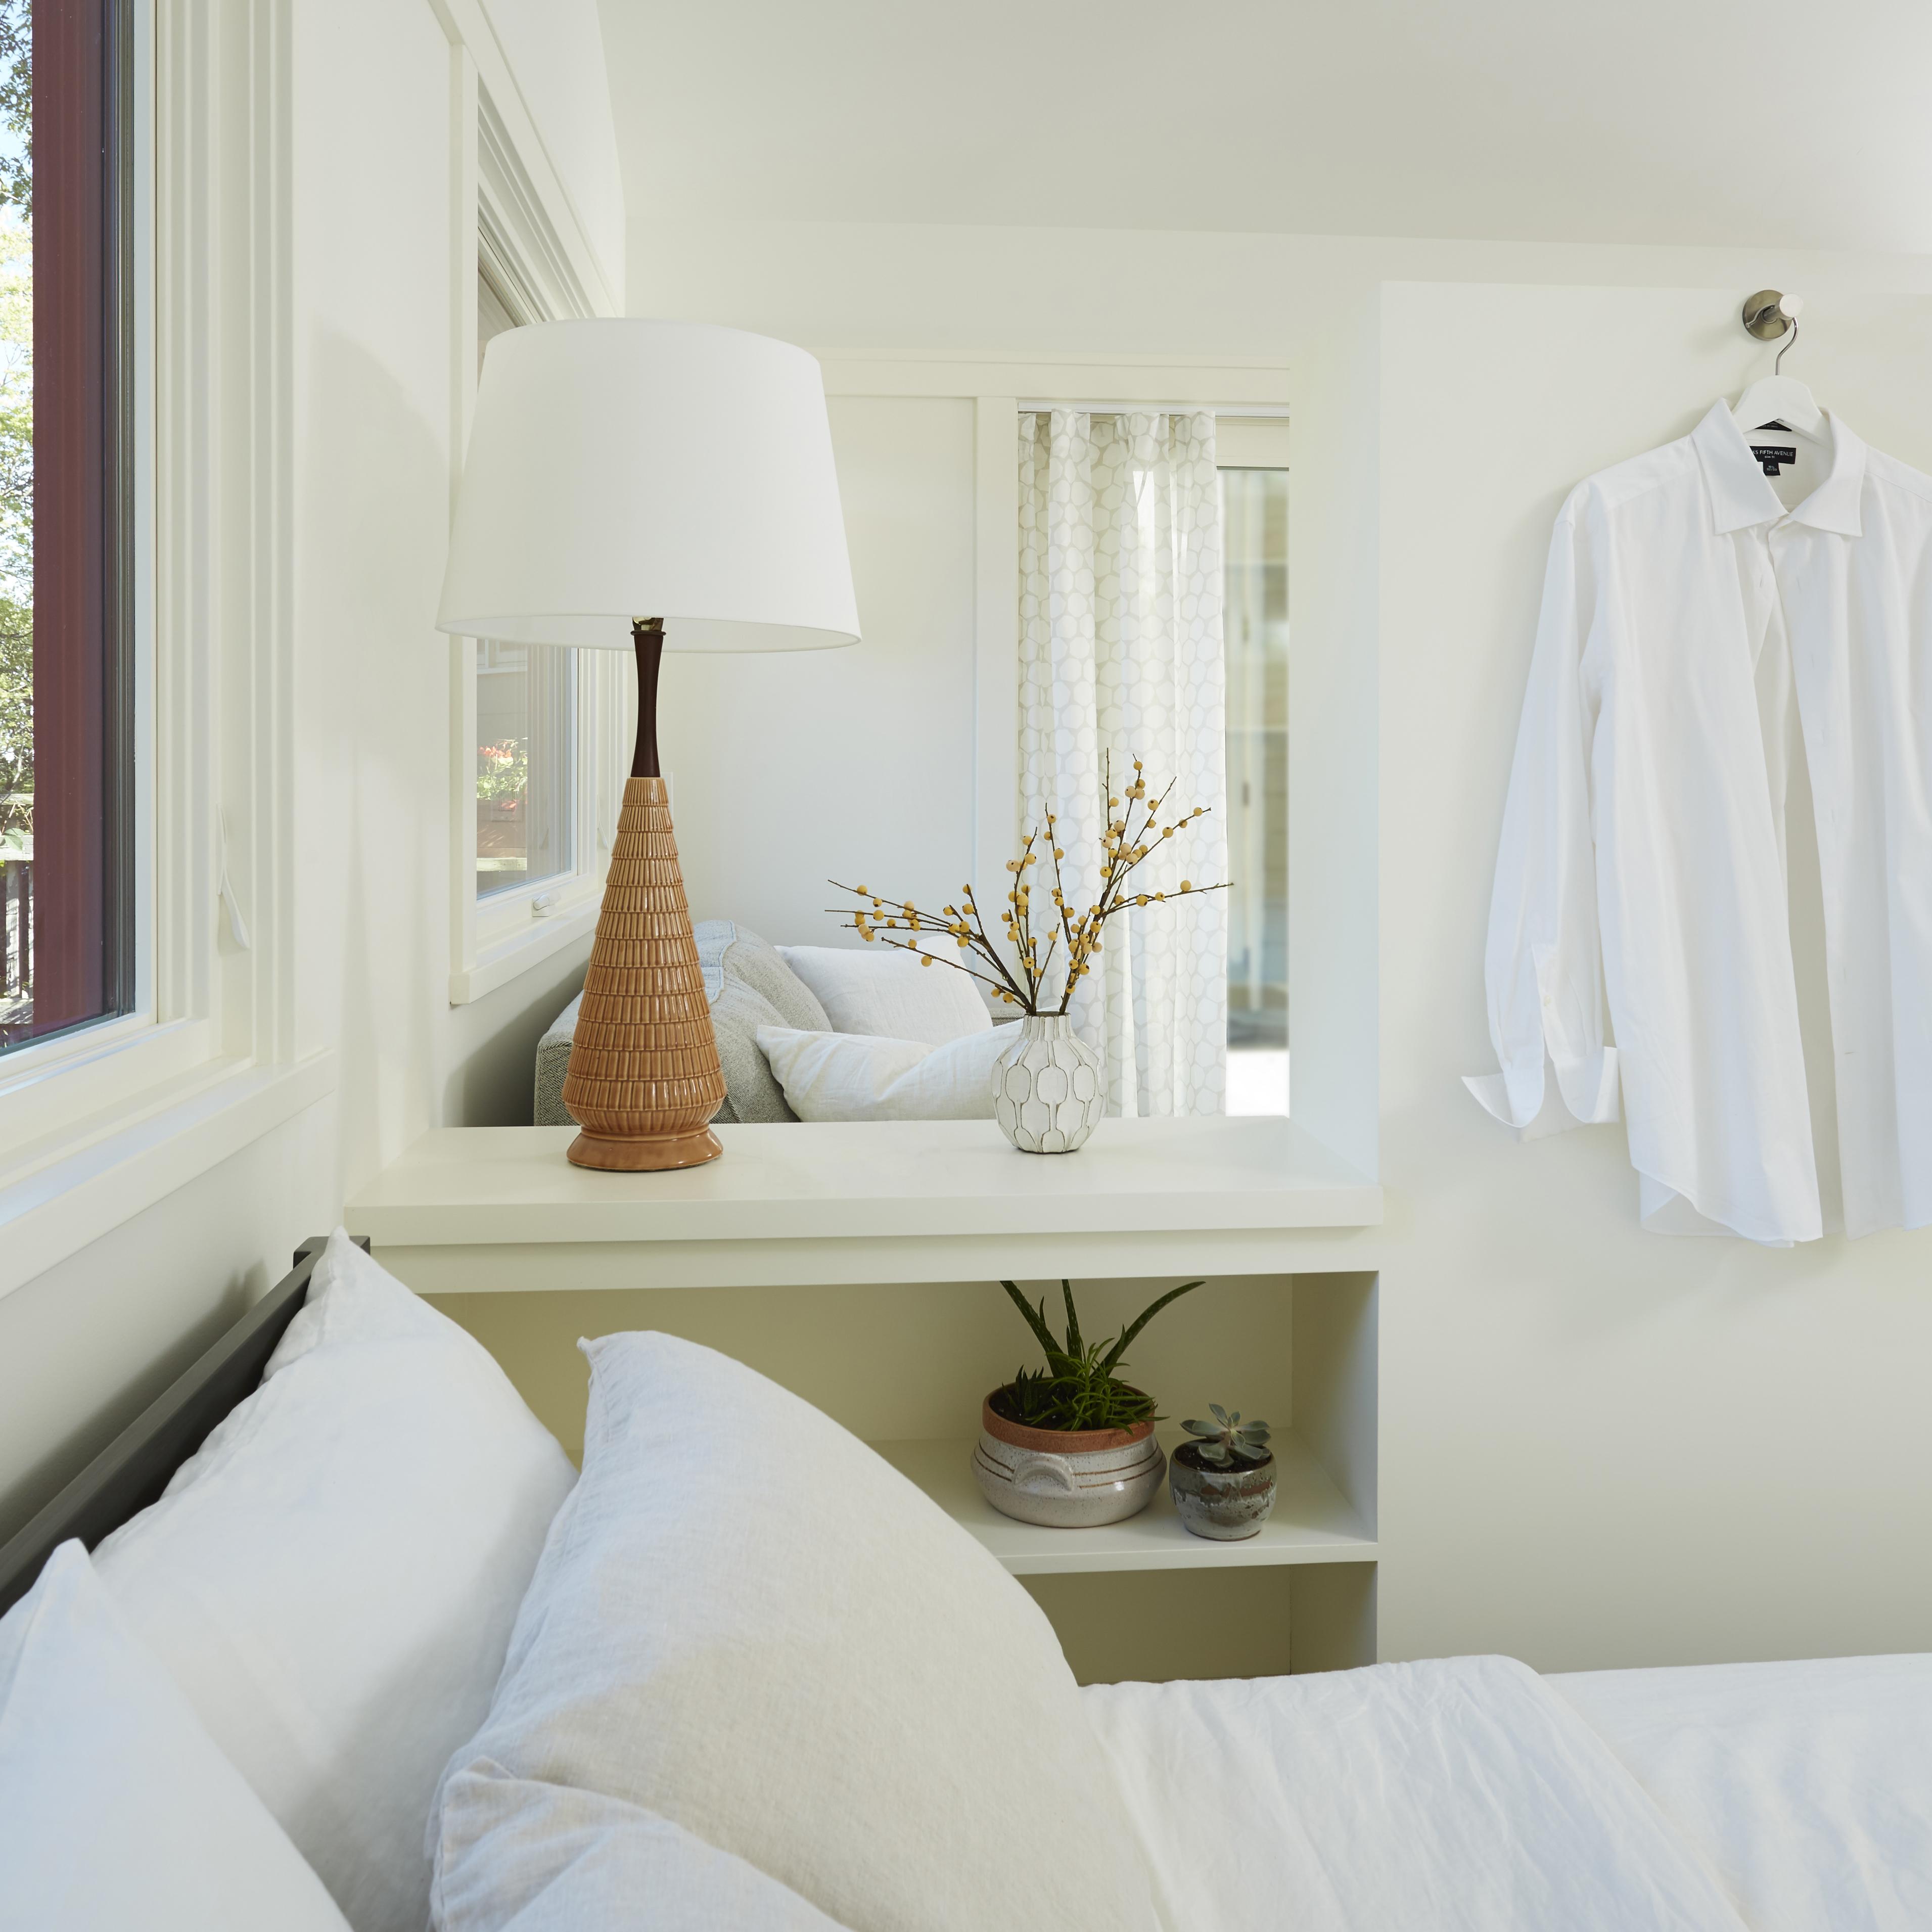 2769-Compact Living Interior Sleeping-3.jpg